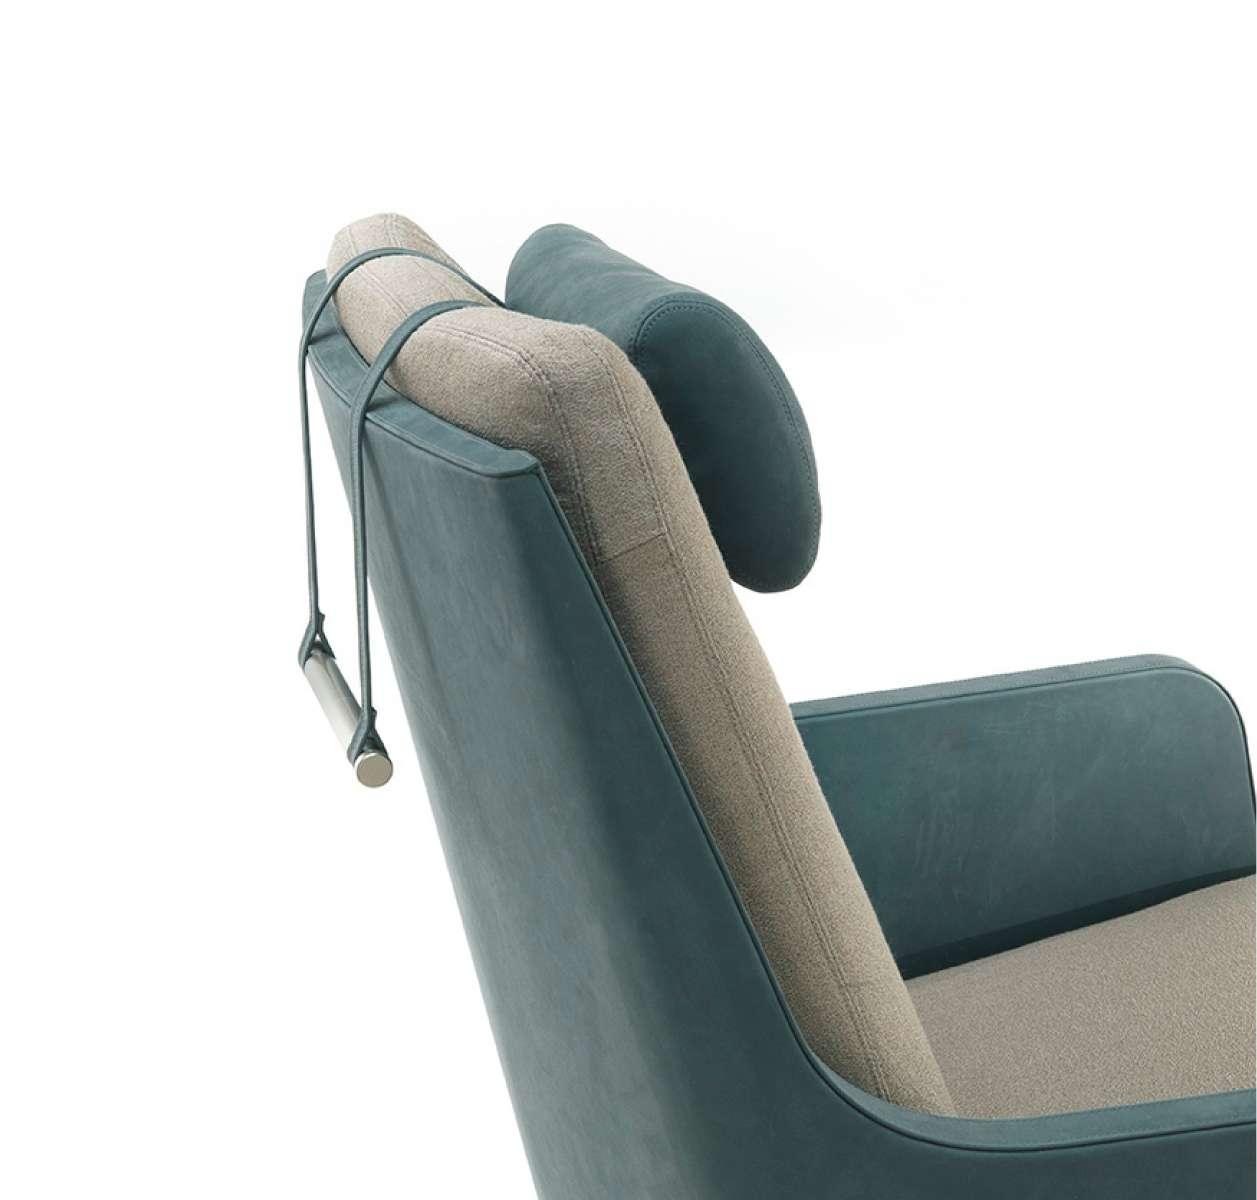 Studio Marco Piva – Product design – 419